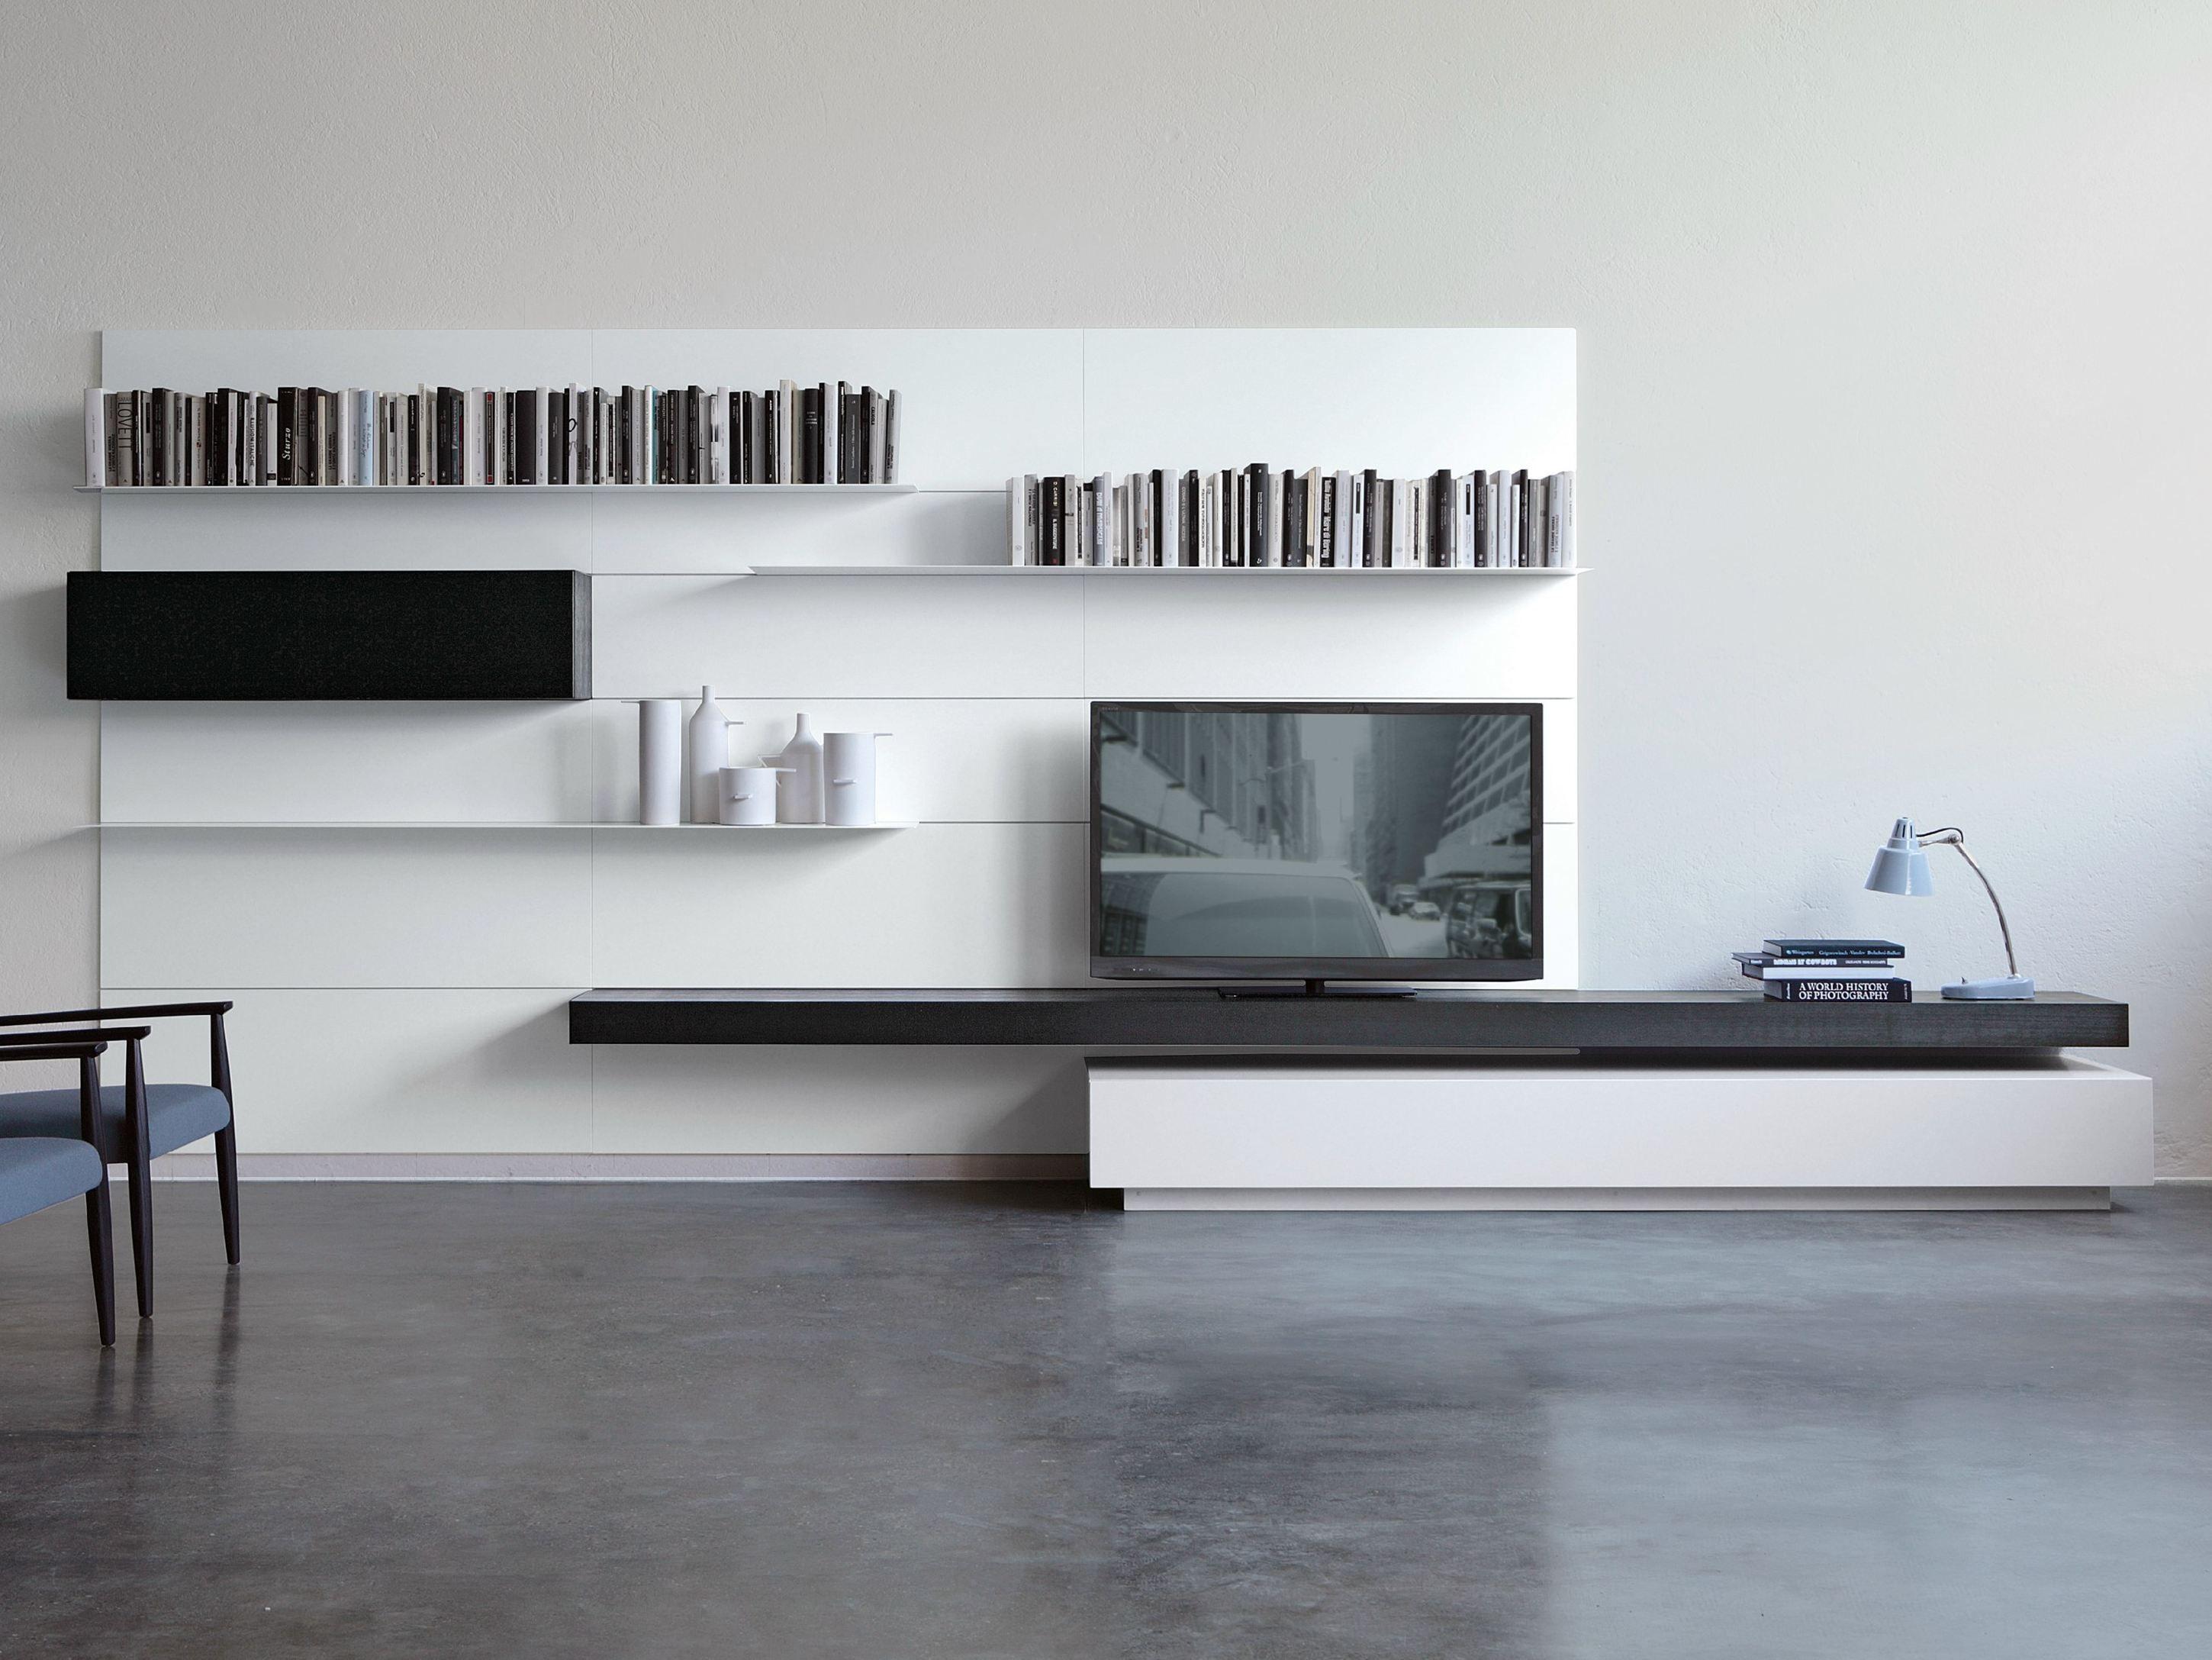 wall-mounted storage wall load it by porro design piero lissoni, Wohnzimmer dekoo